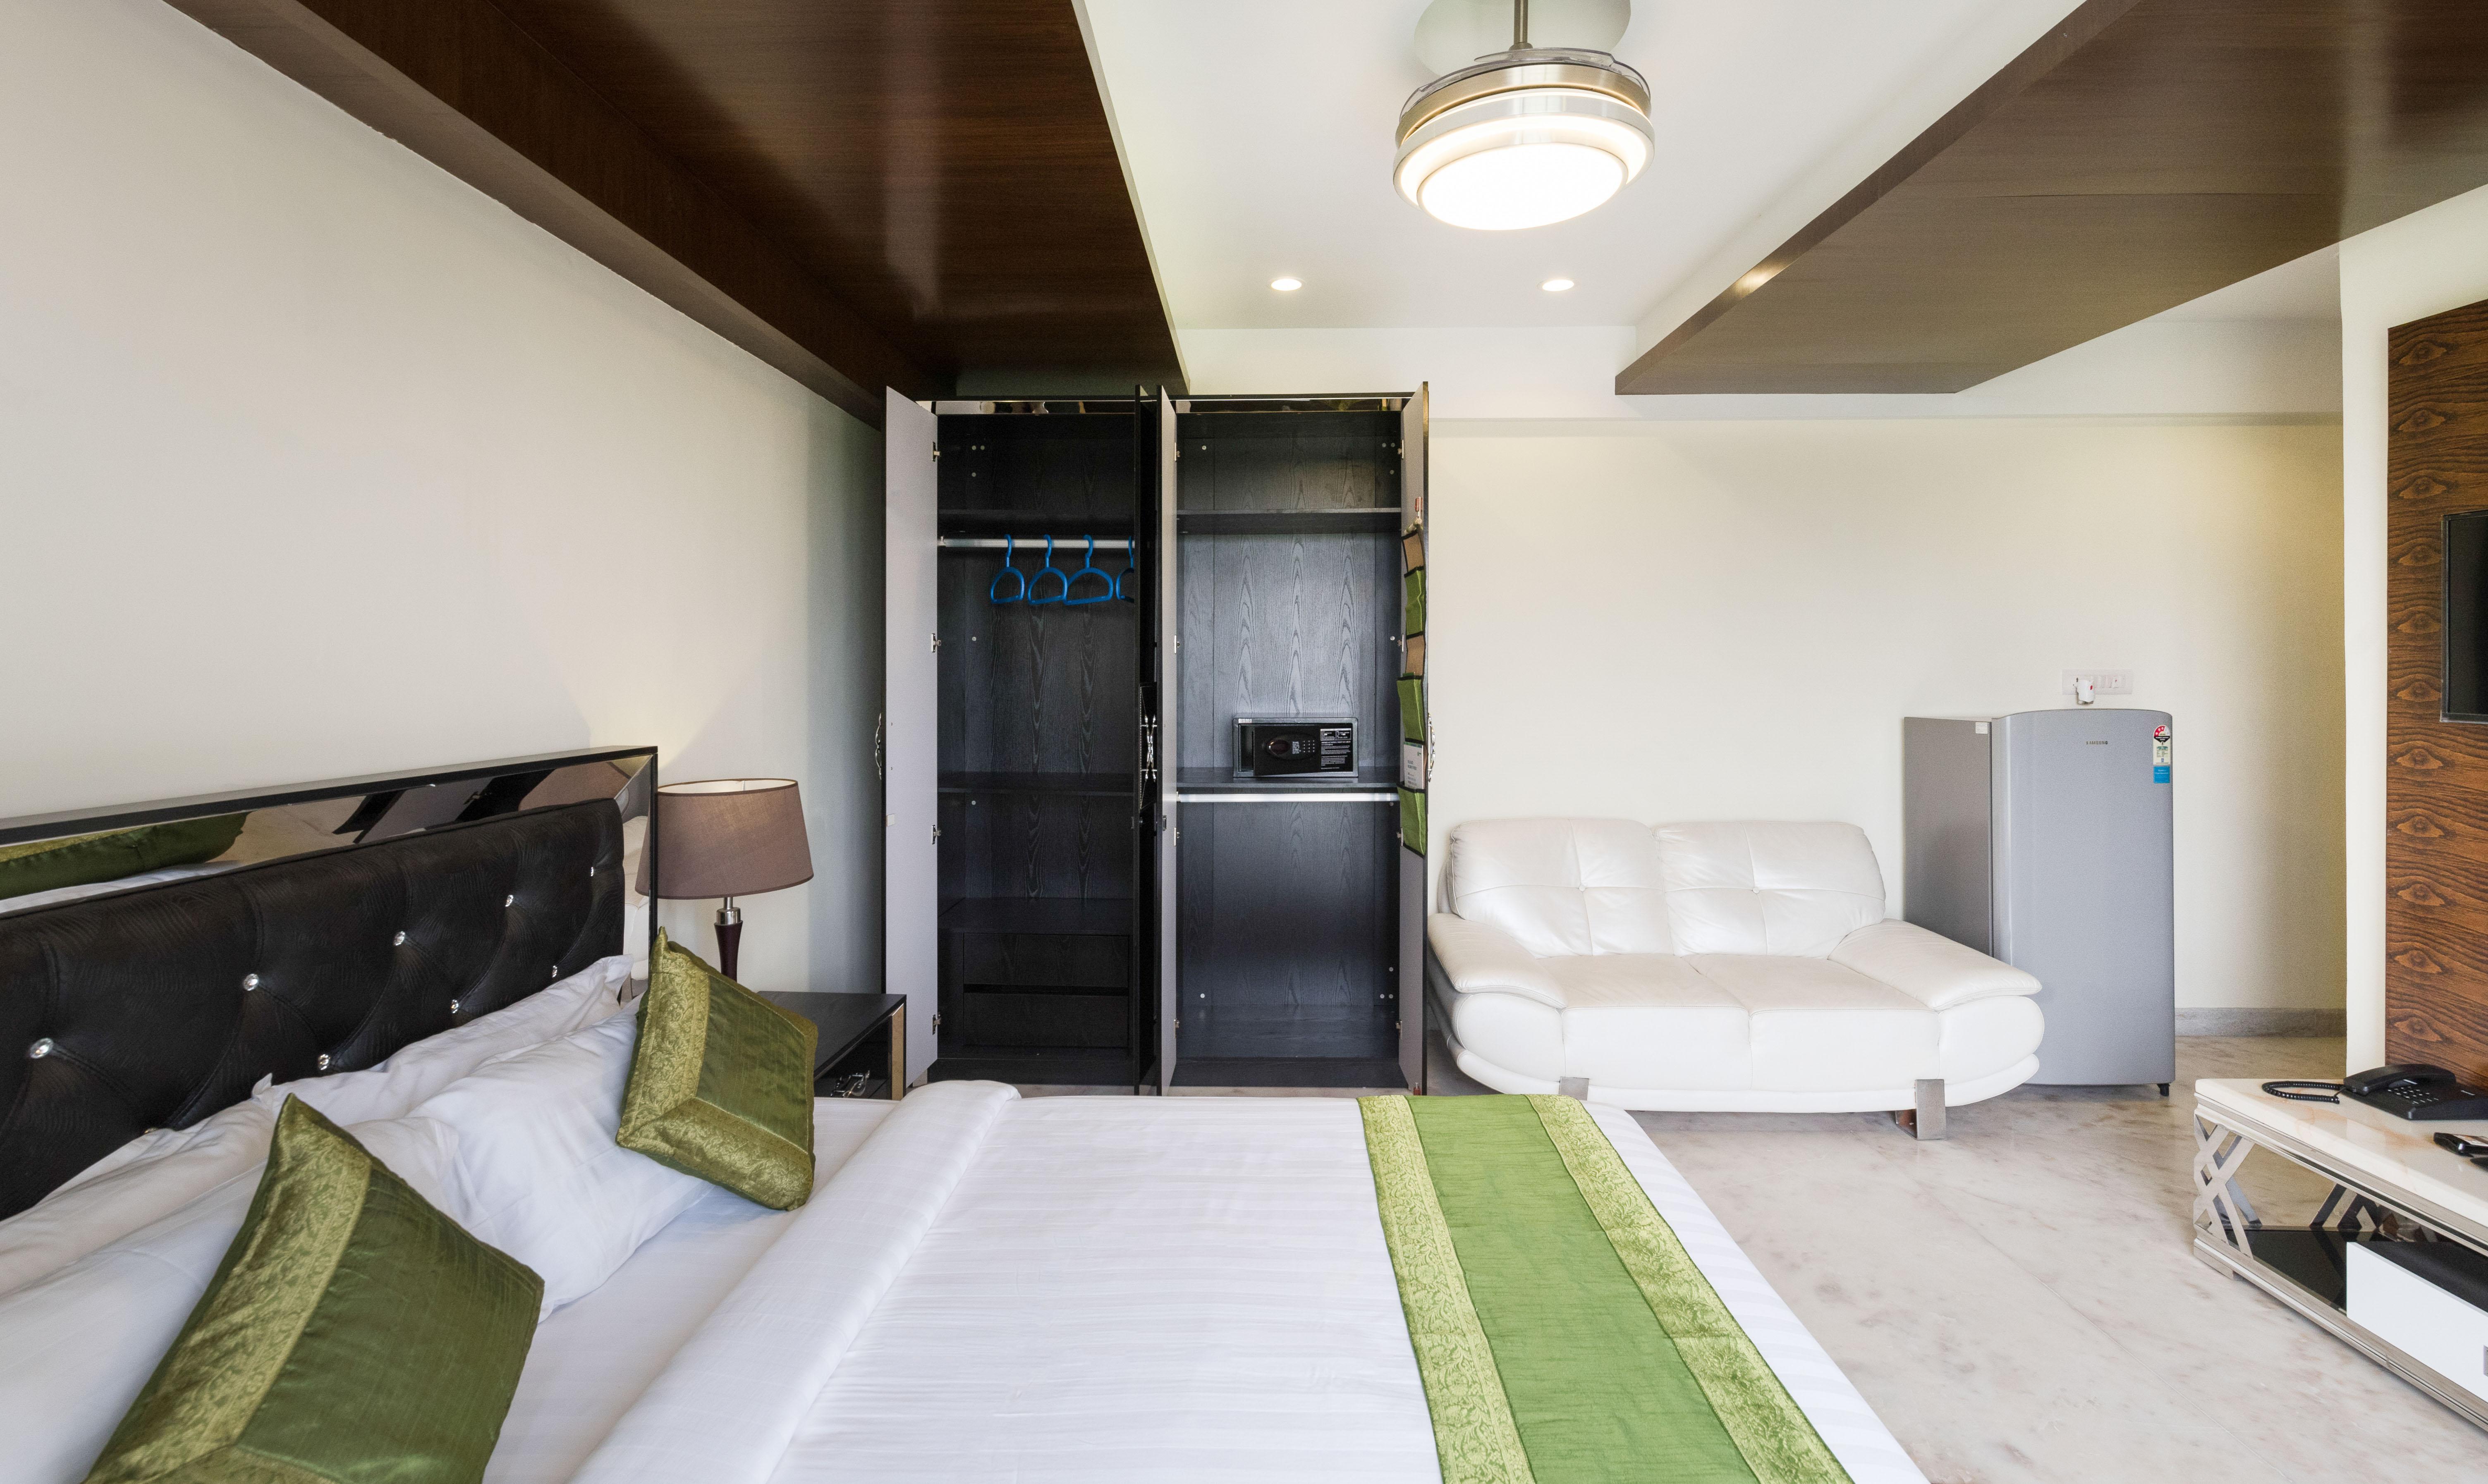 Hotels in Kolkata | Book the Best Hotels in Kolkata - Tariff